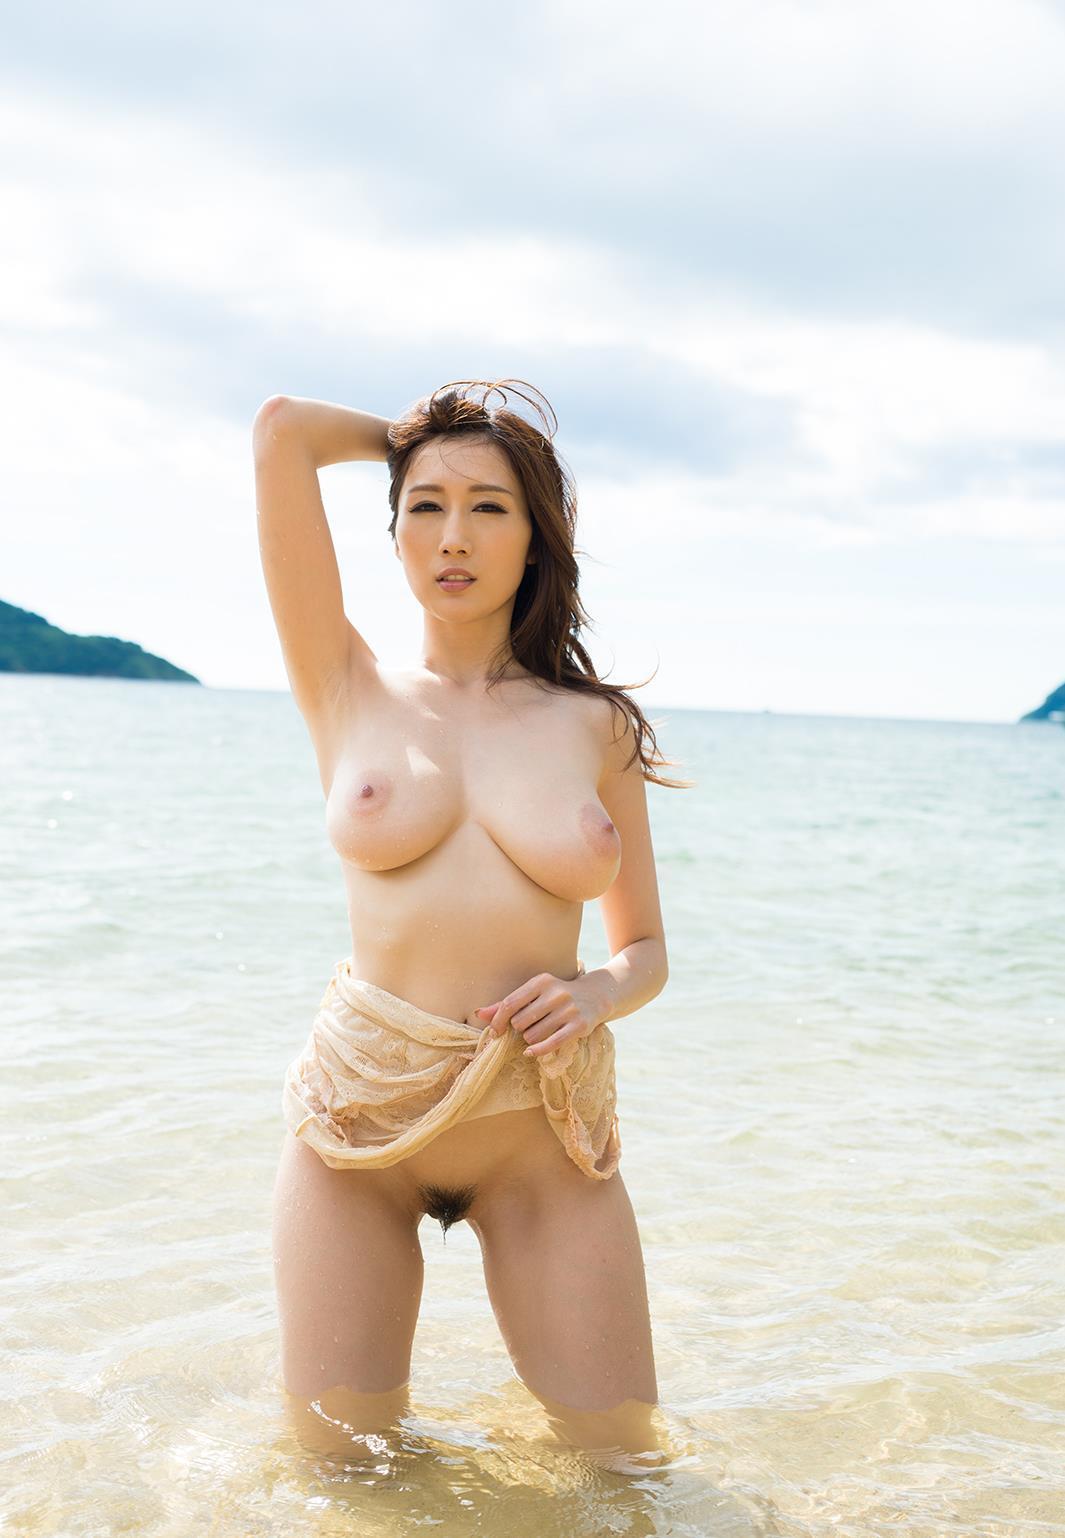 AV女優・JULIA(ジュリア) ヌード画像 83